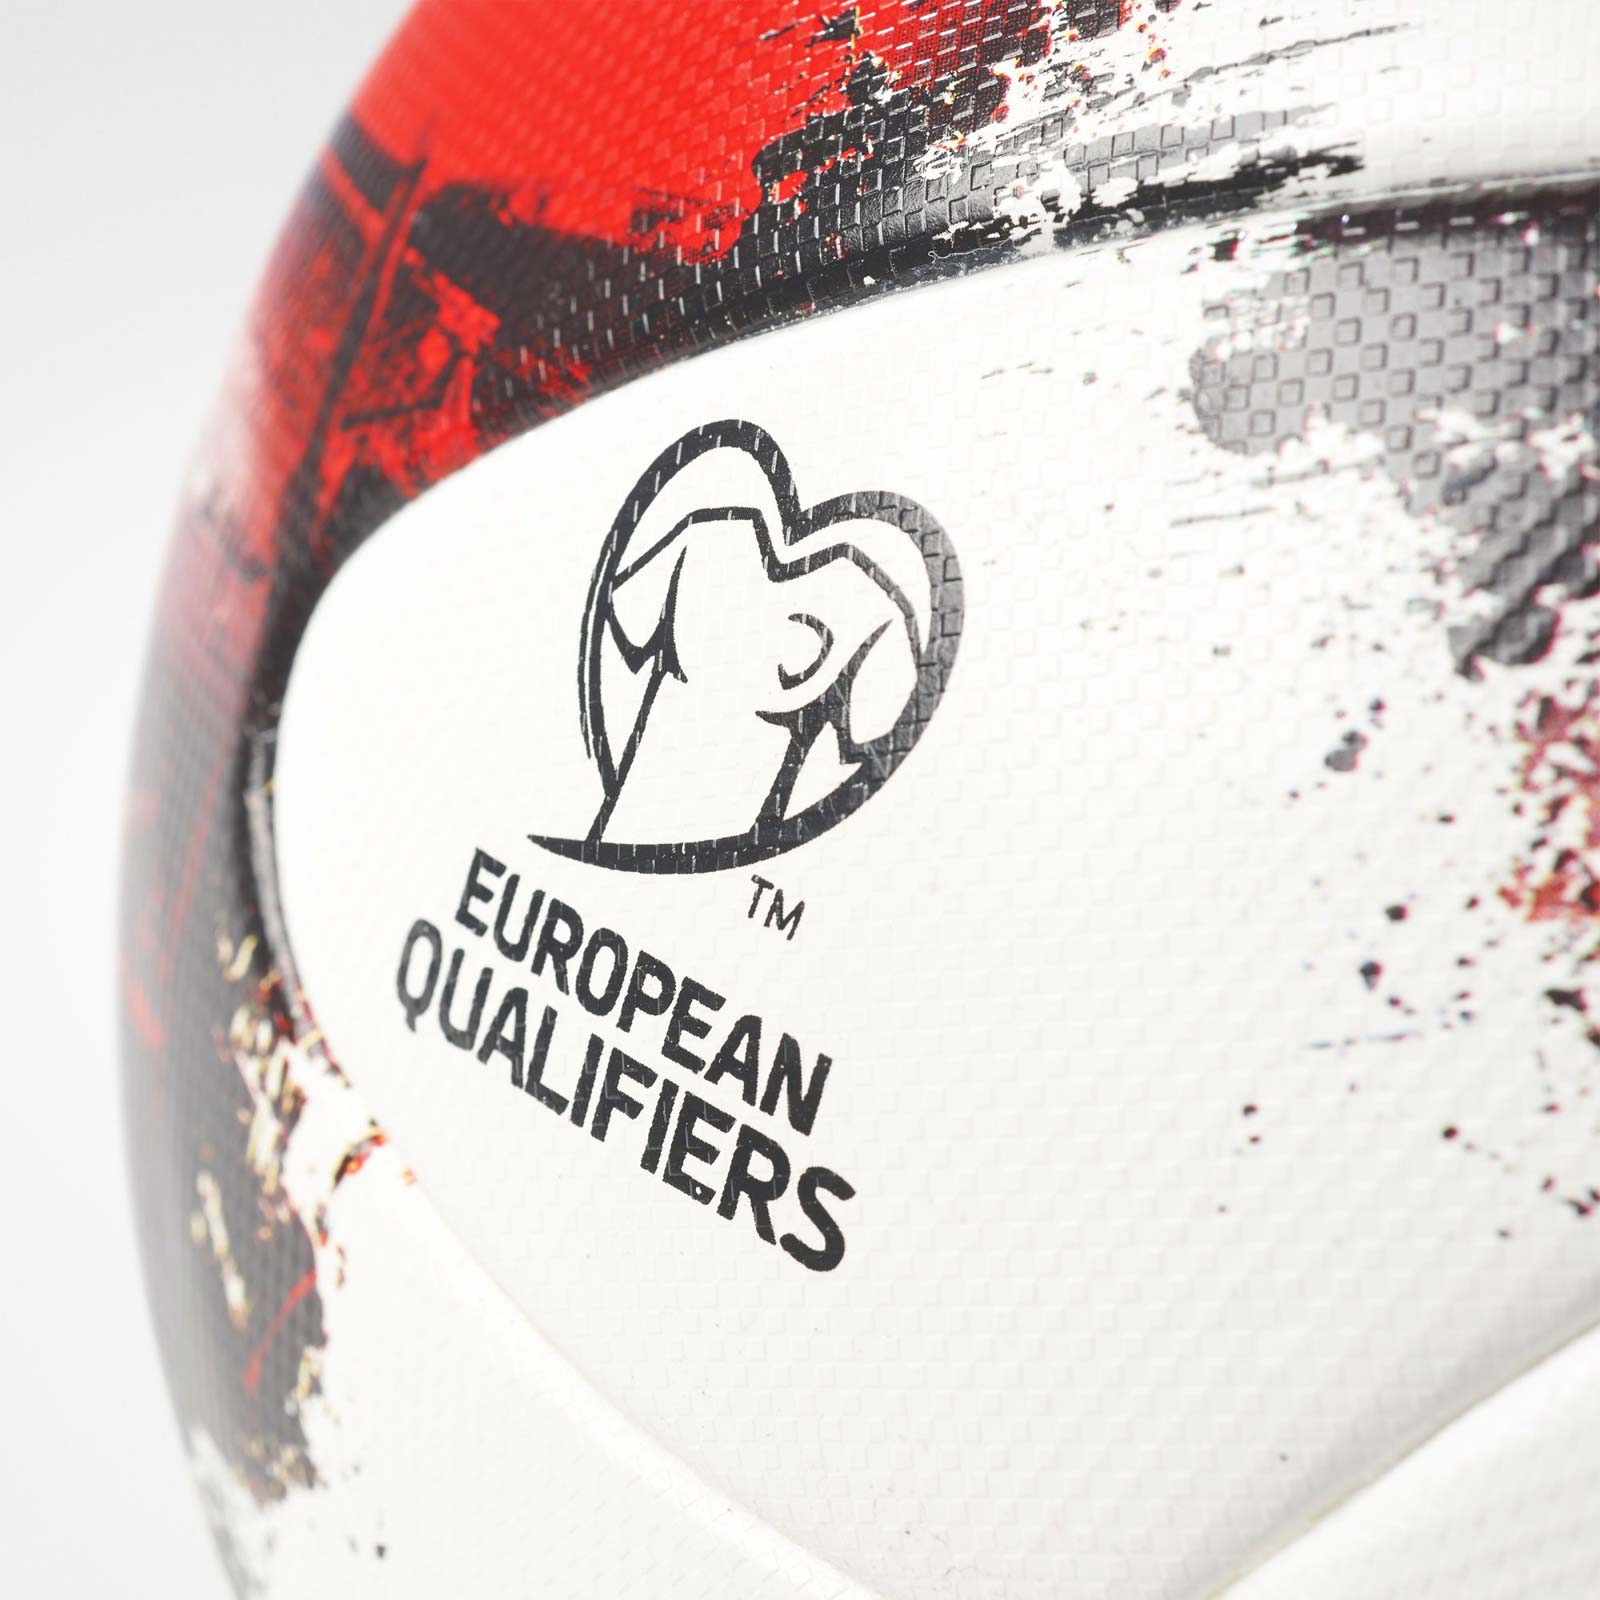 Euro Wc Qualifying